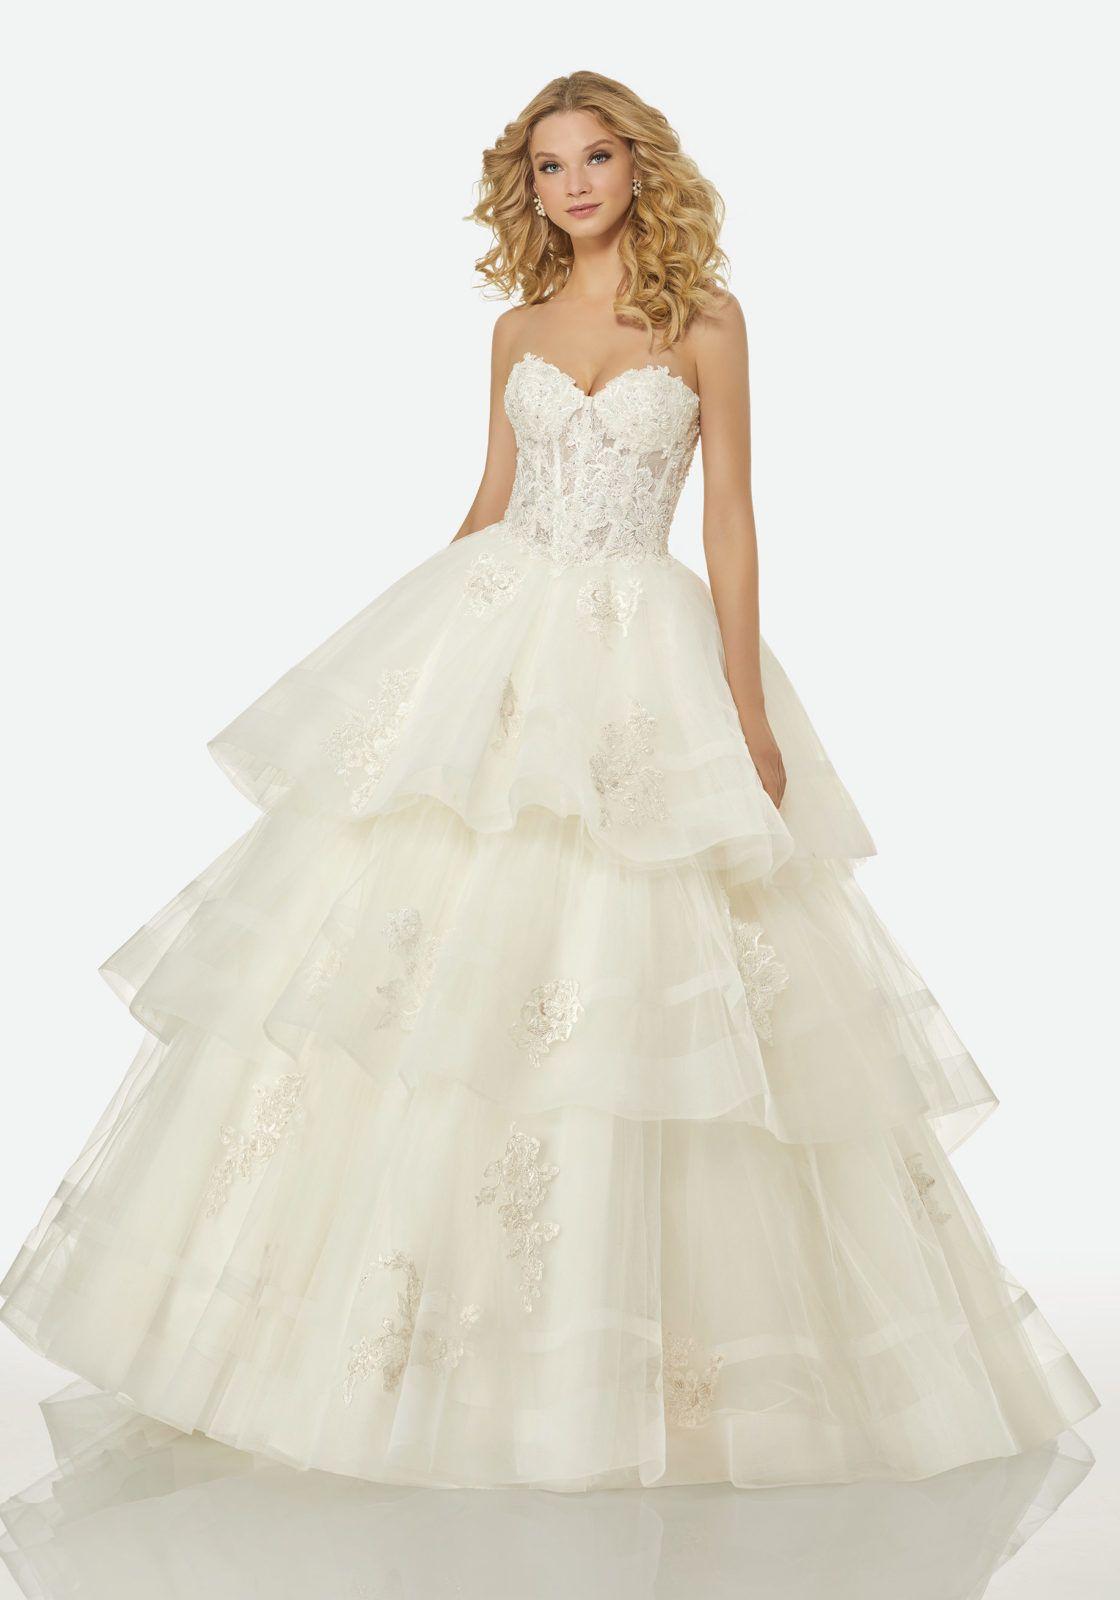 Bella Wedding Dress | Randy Fenoli Bridal | Weddings | Pinterest ...